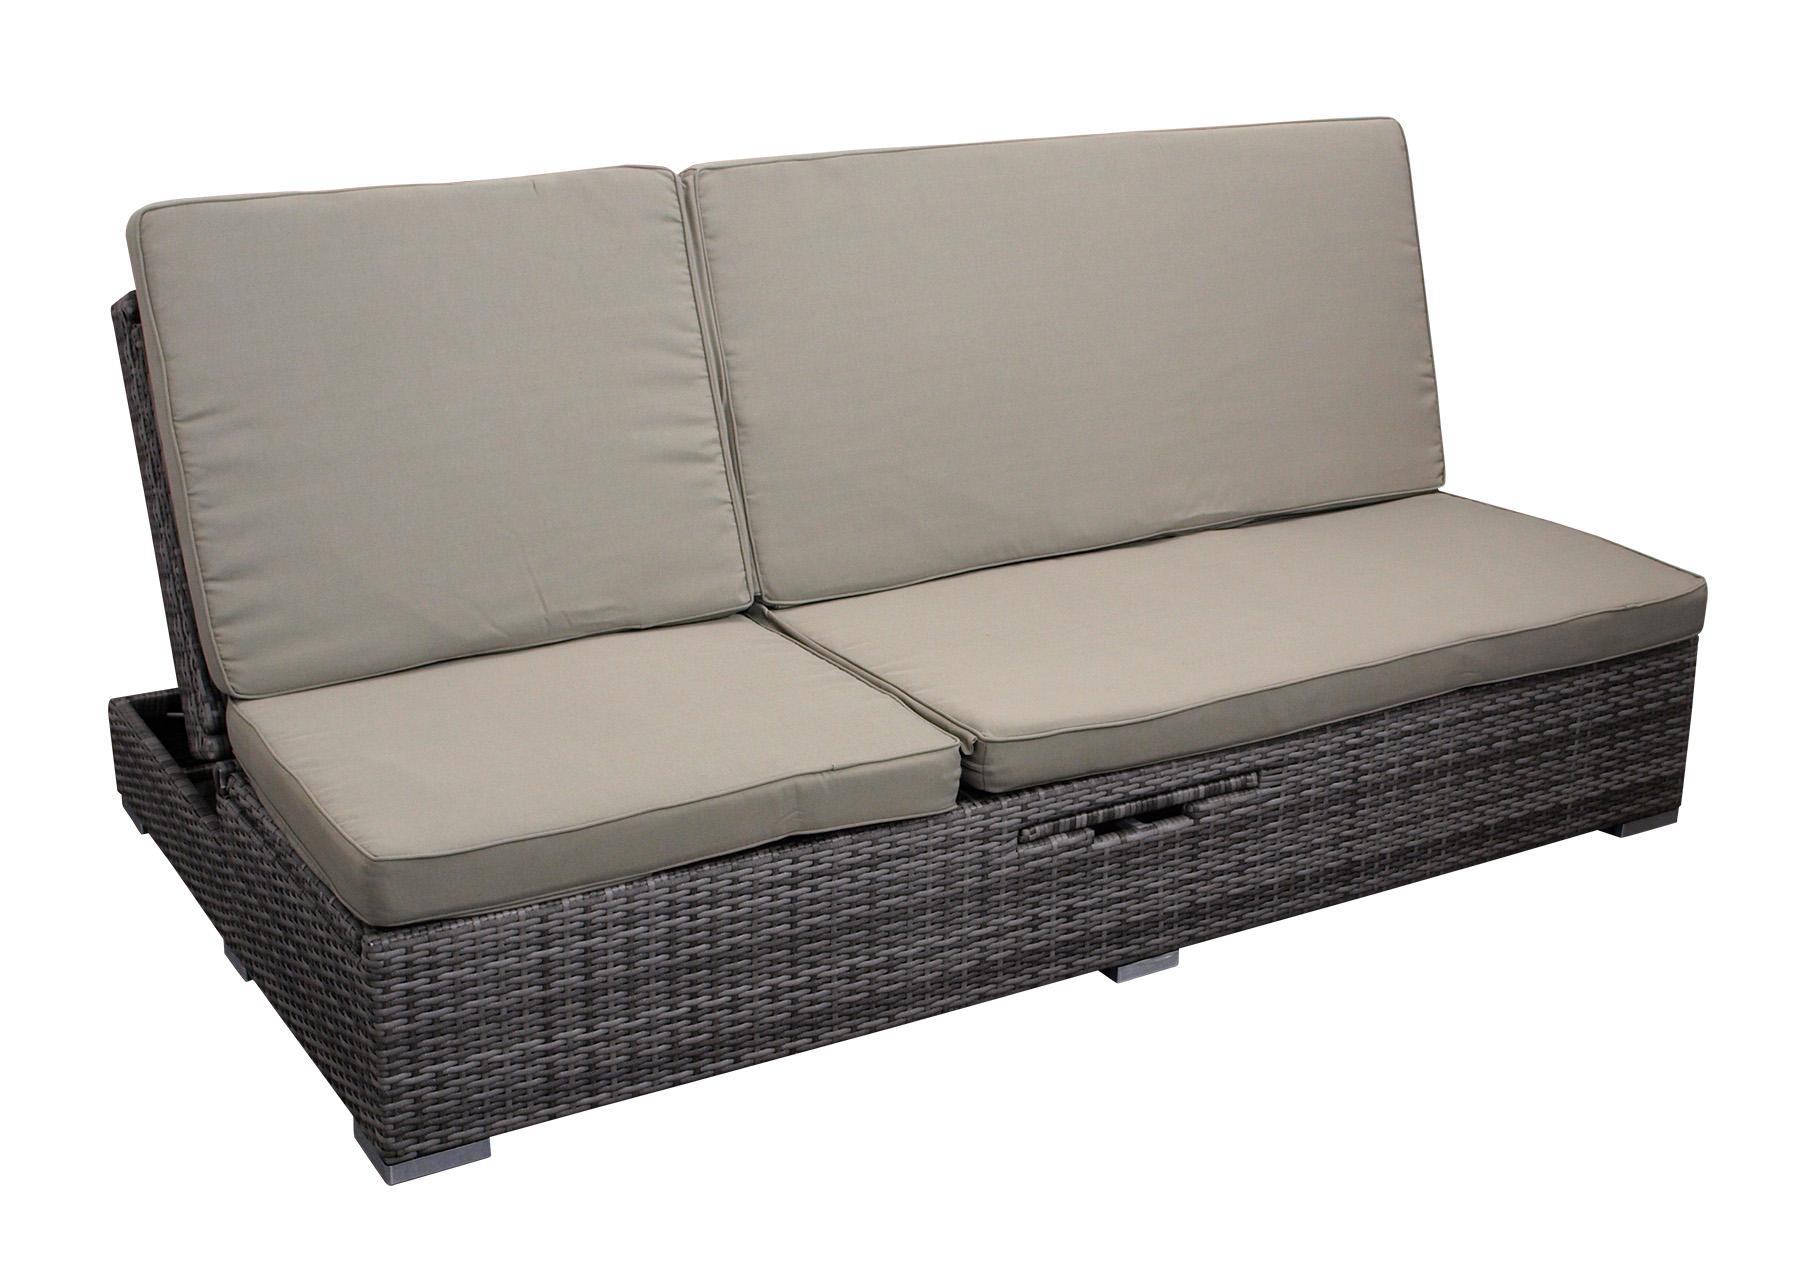 gartenliege doppelliege rattanliege funktionsliege gartensofa calero 2 wahl ebay. Black Bedroom Furniture Sets. Home Design Ideas